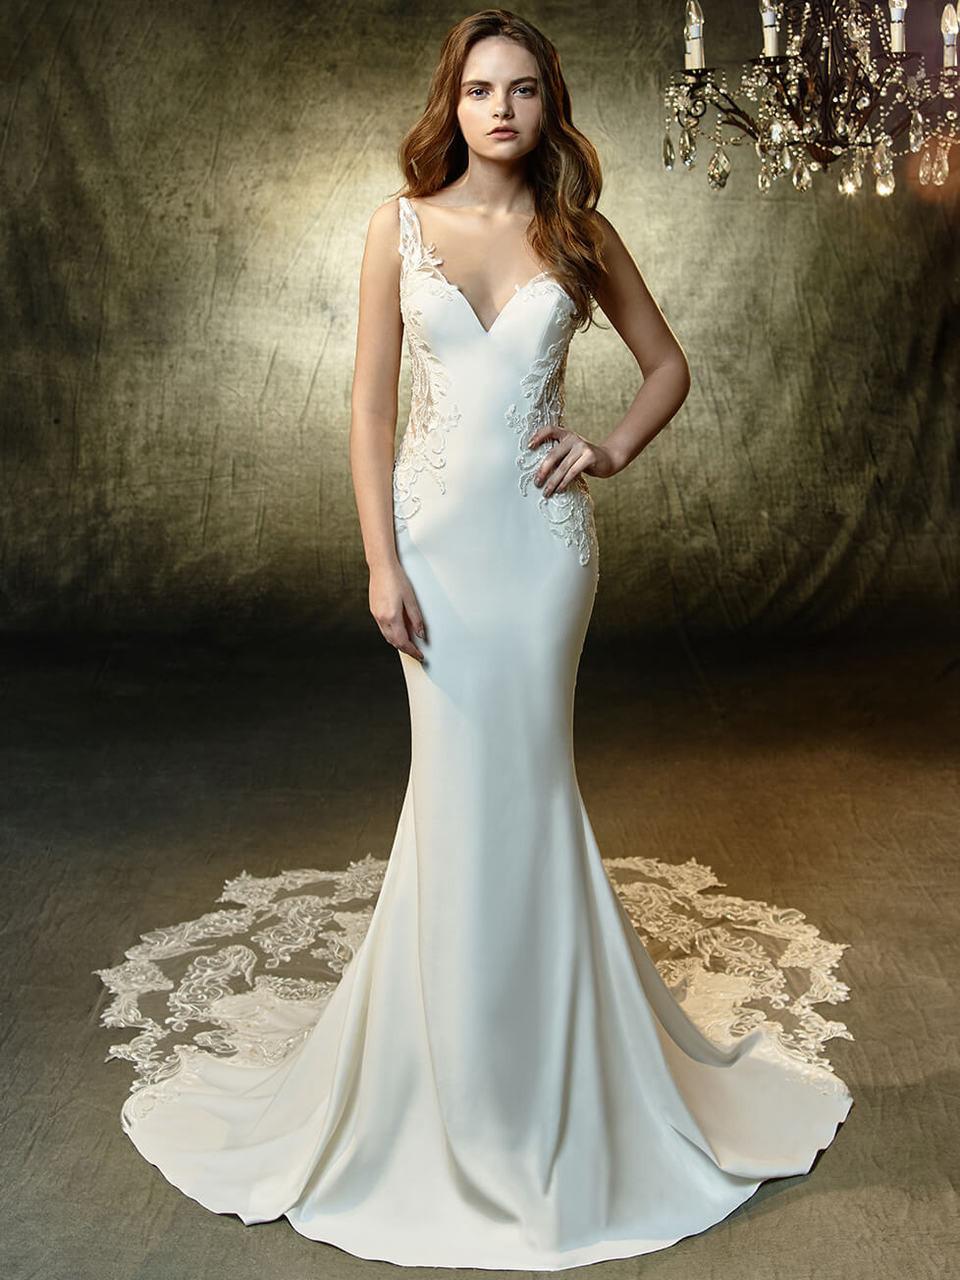 732bb7bff6d Deep Sweetheart Wedding Gown Blue by Enzoani Laramie